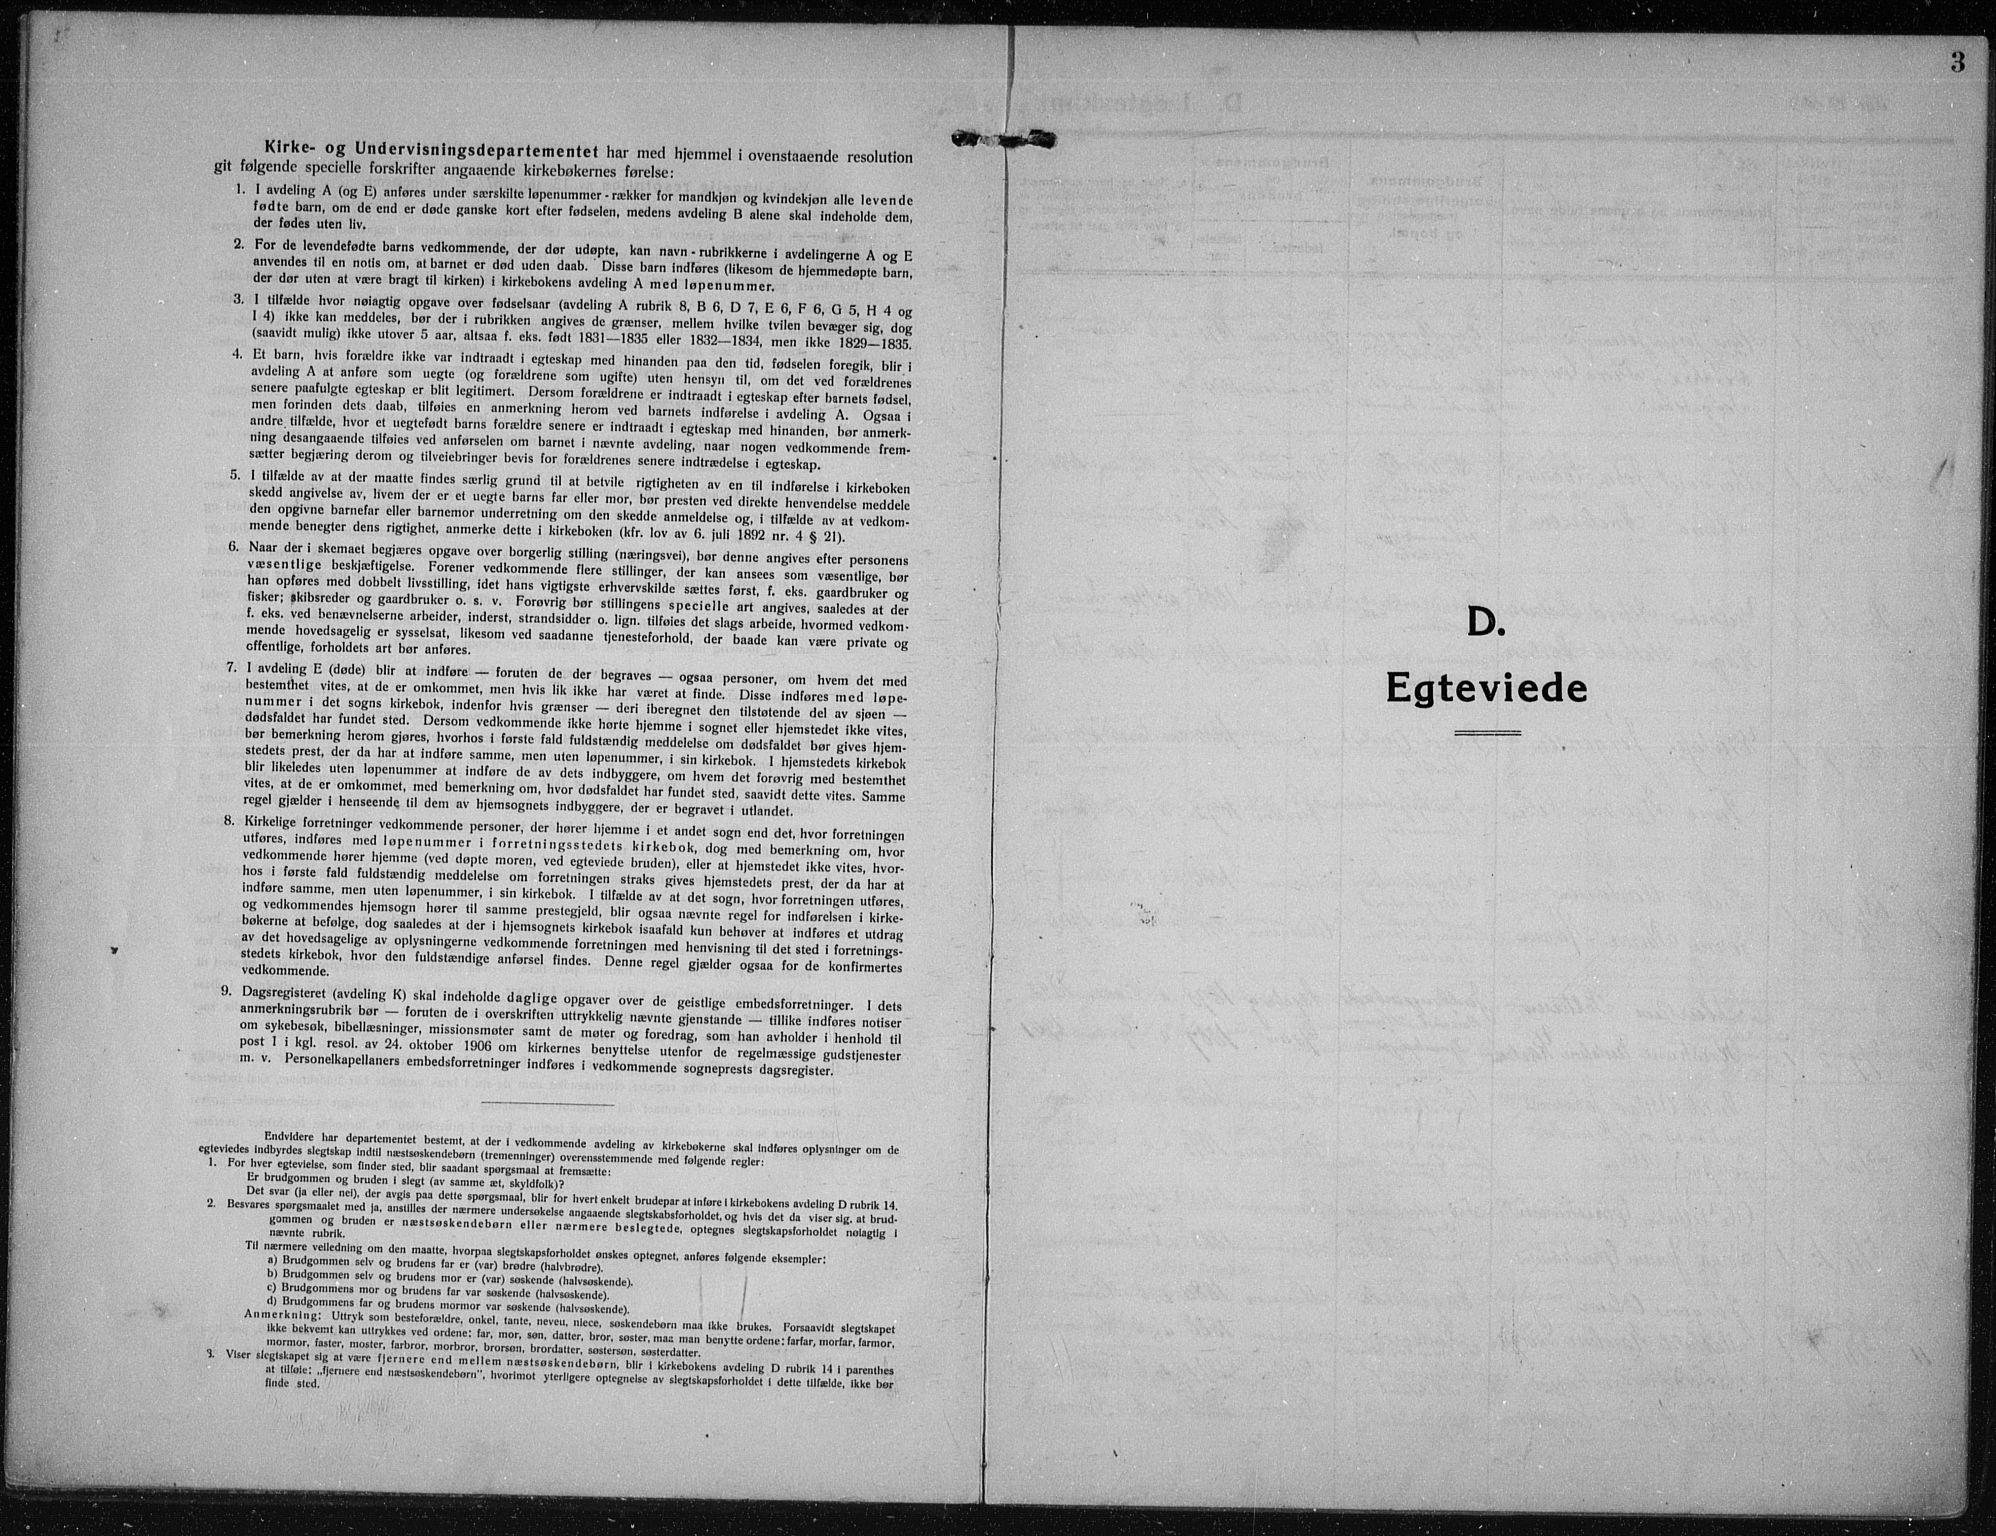 SAKO, Hurum kirkebøker, F/Fa/L0017: Ministerialbok nr. 17, 1910-1925, s. 3